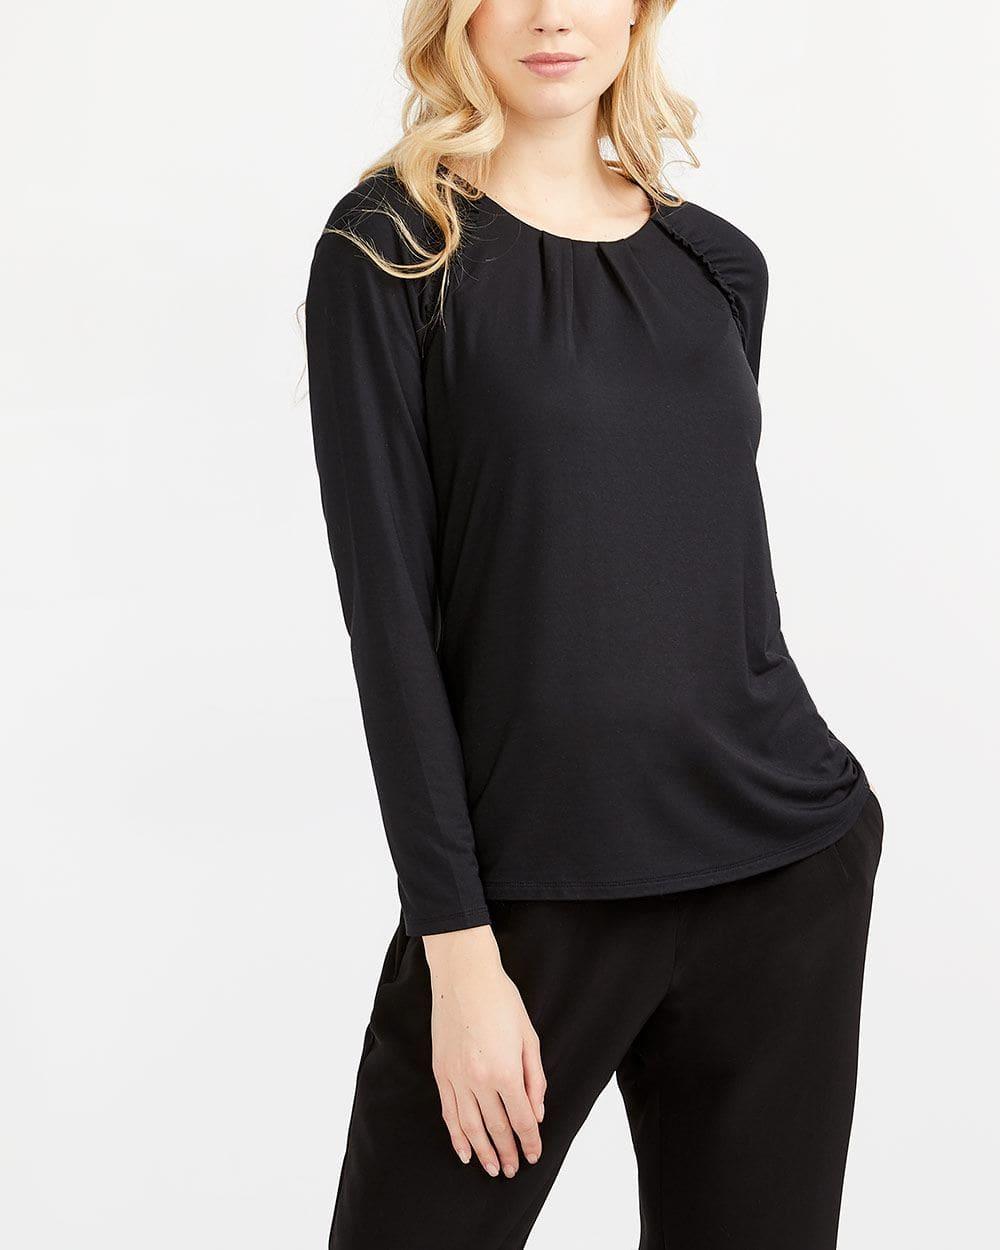 Willow & Thread Ruched Raglan Sleeve Top